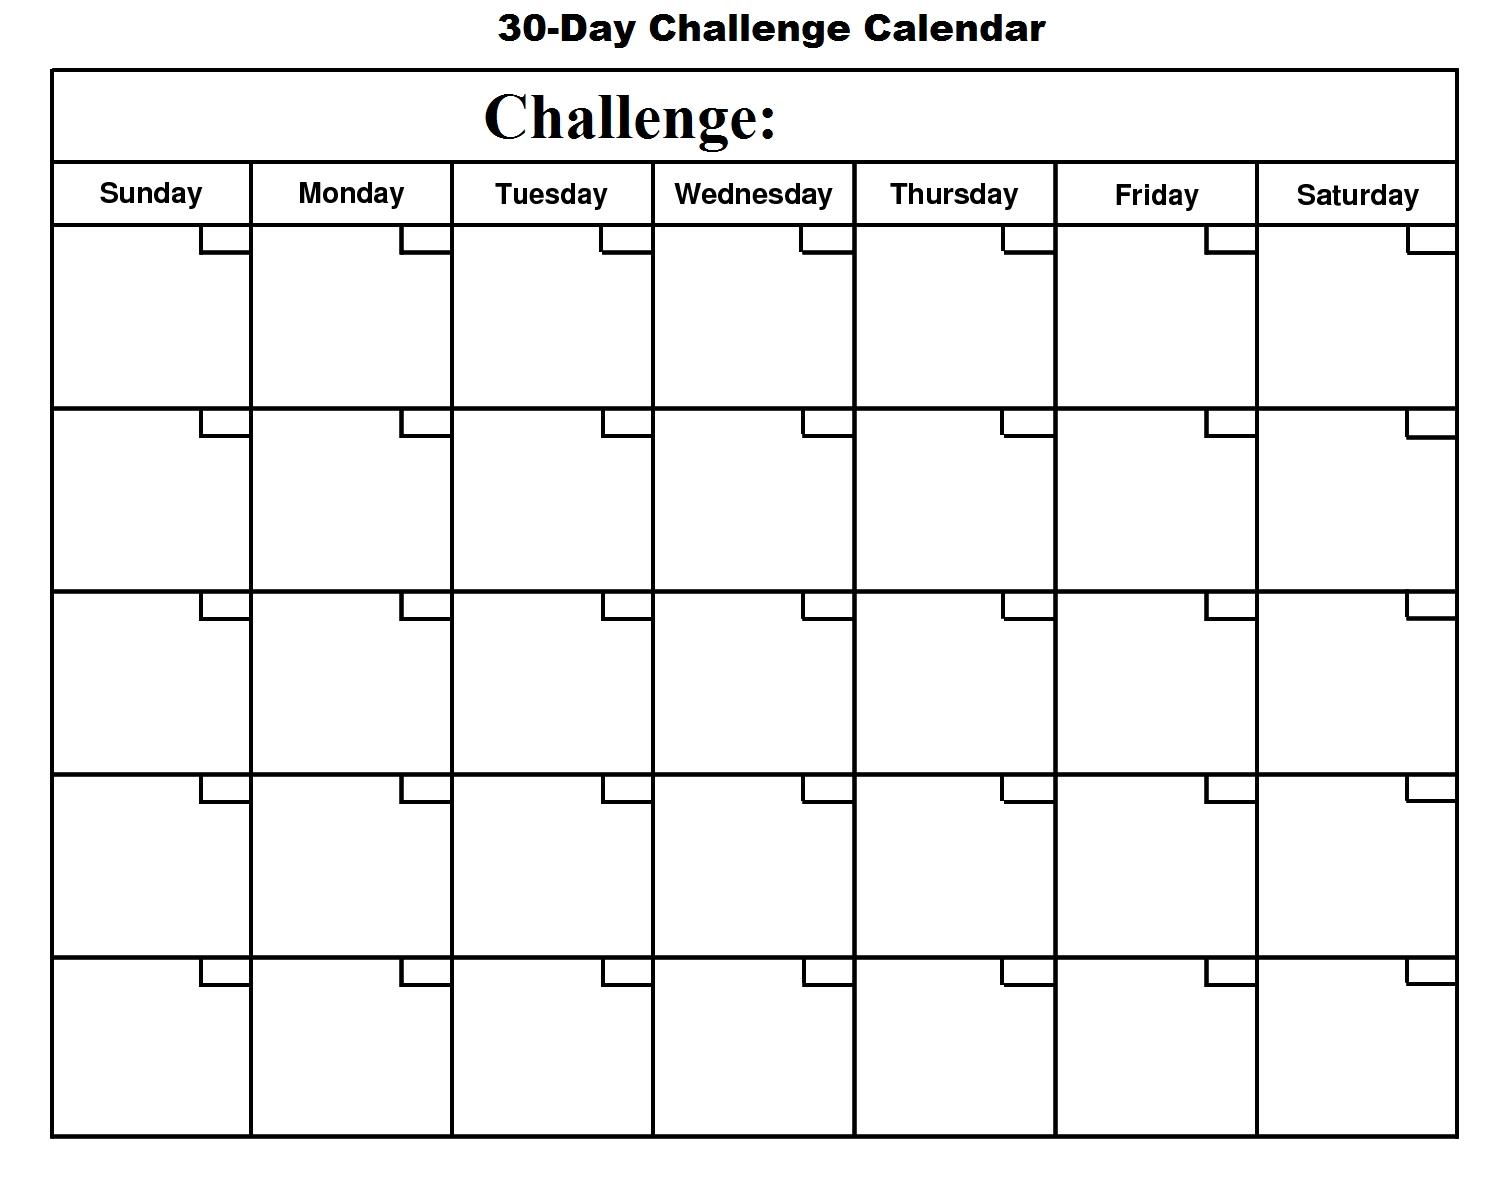 Blank 30 Day Month Calendar | Example Calendar Printable within 30 Day Blank Calendar